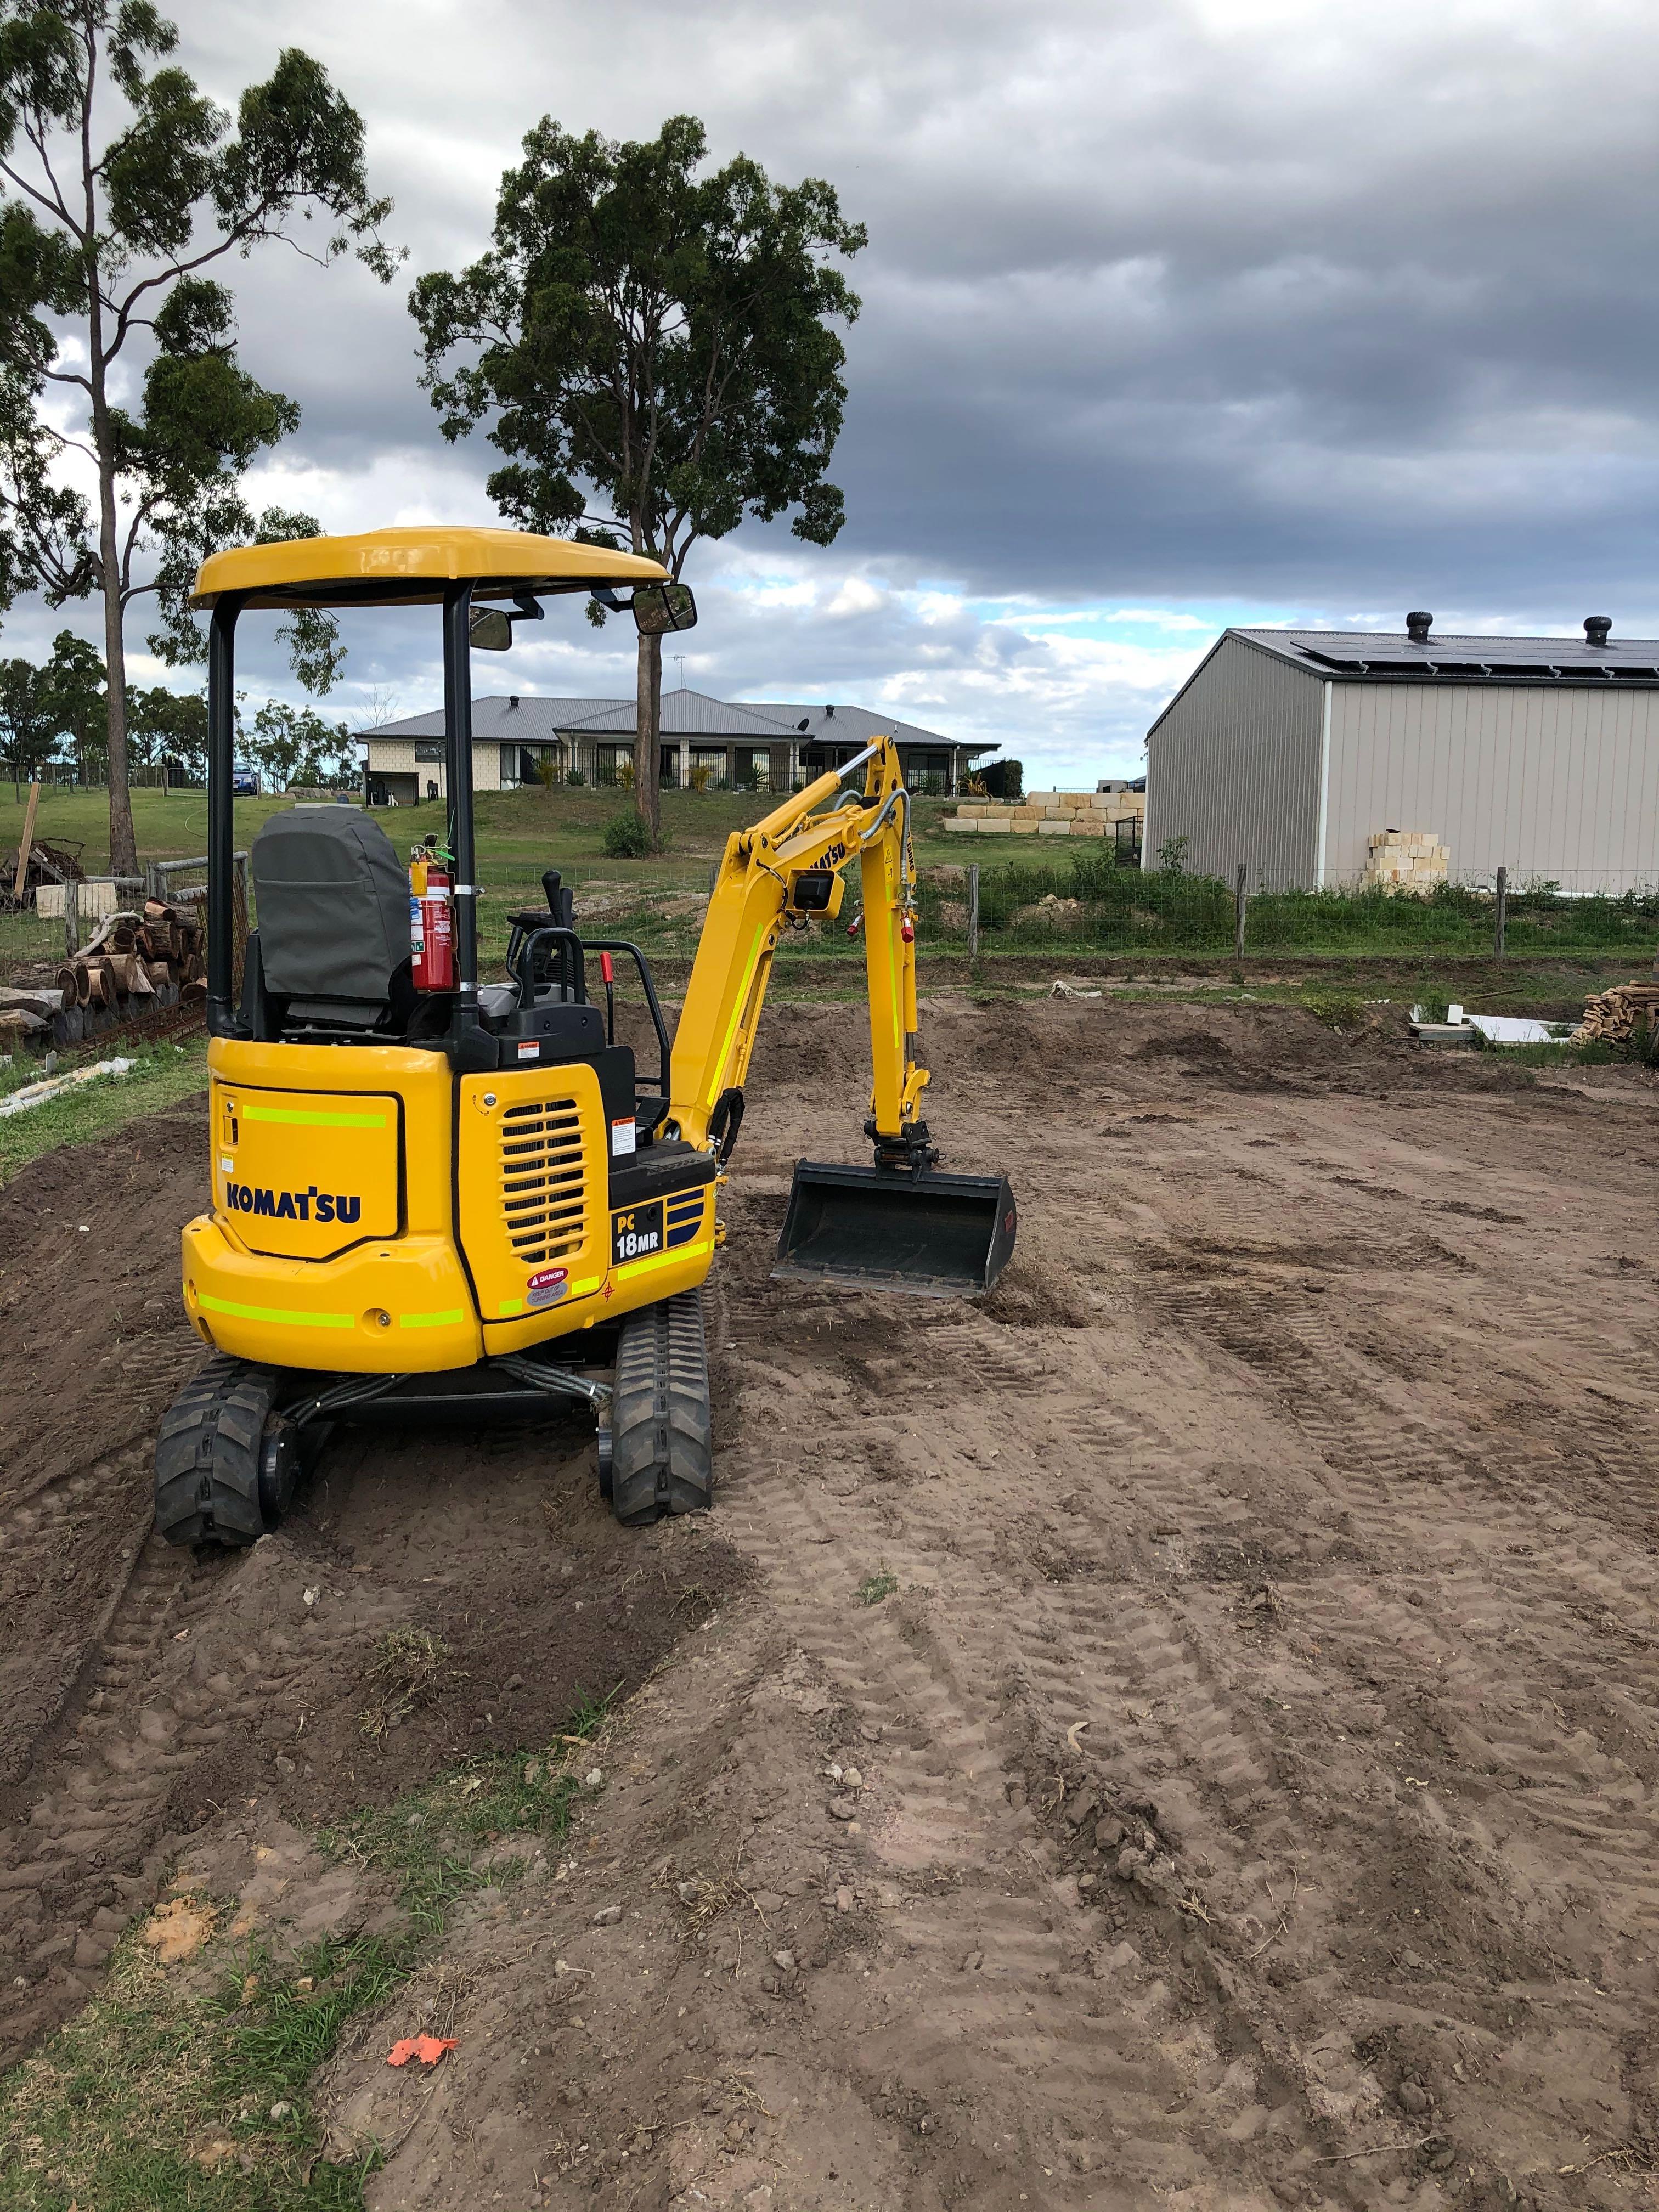 Hire PC18 Komatsu Mini Digger Excavator